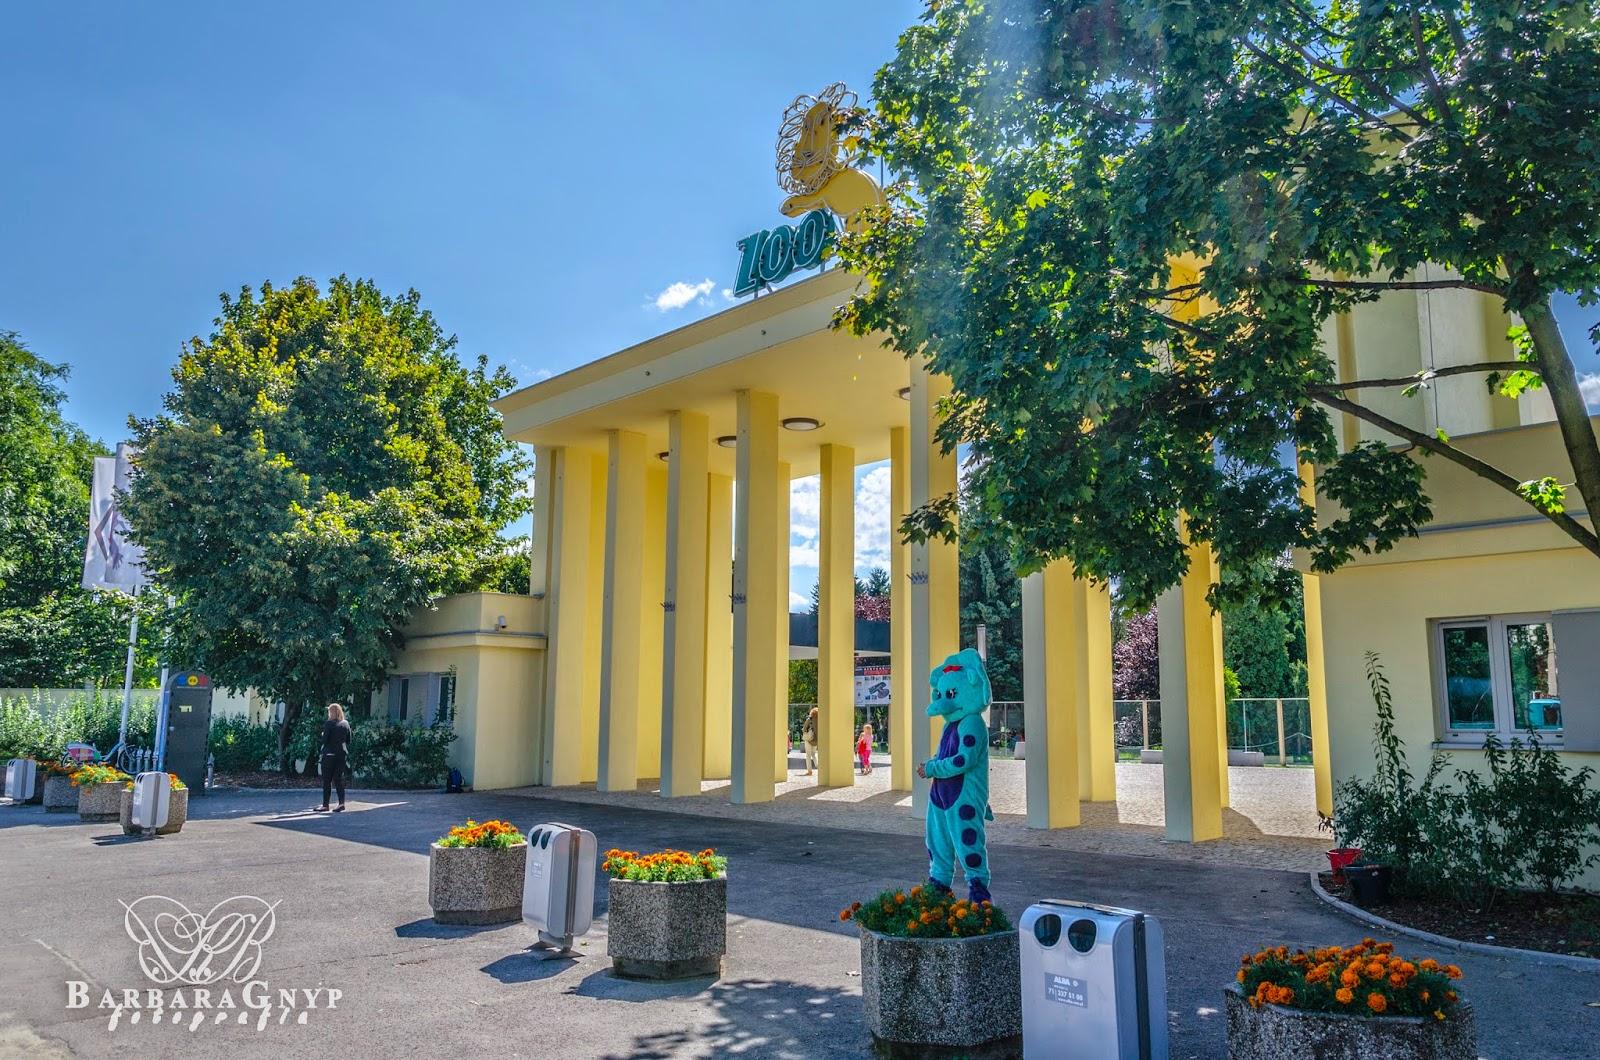 http://www.barbaragnyp.pl/2014/09/ogrod-zoologiczny-wrocaw.html